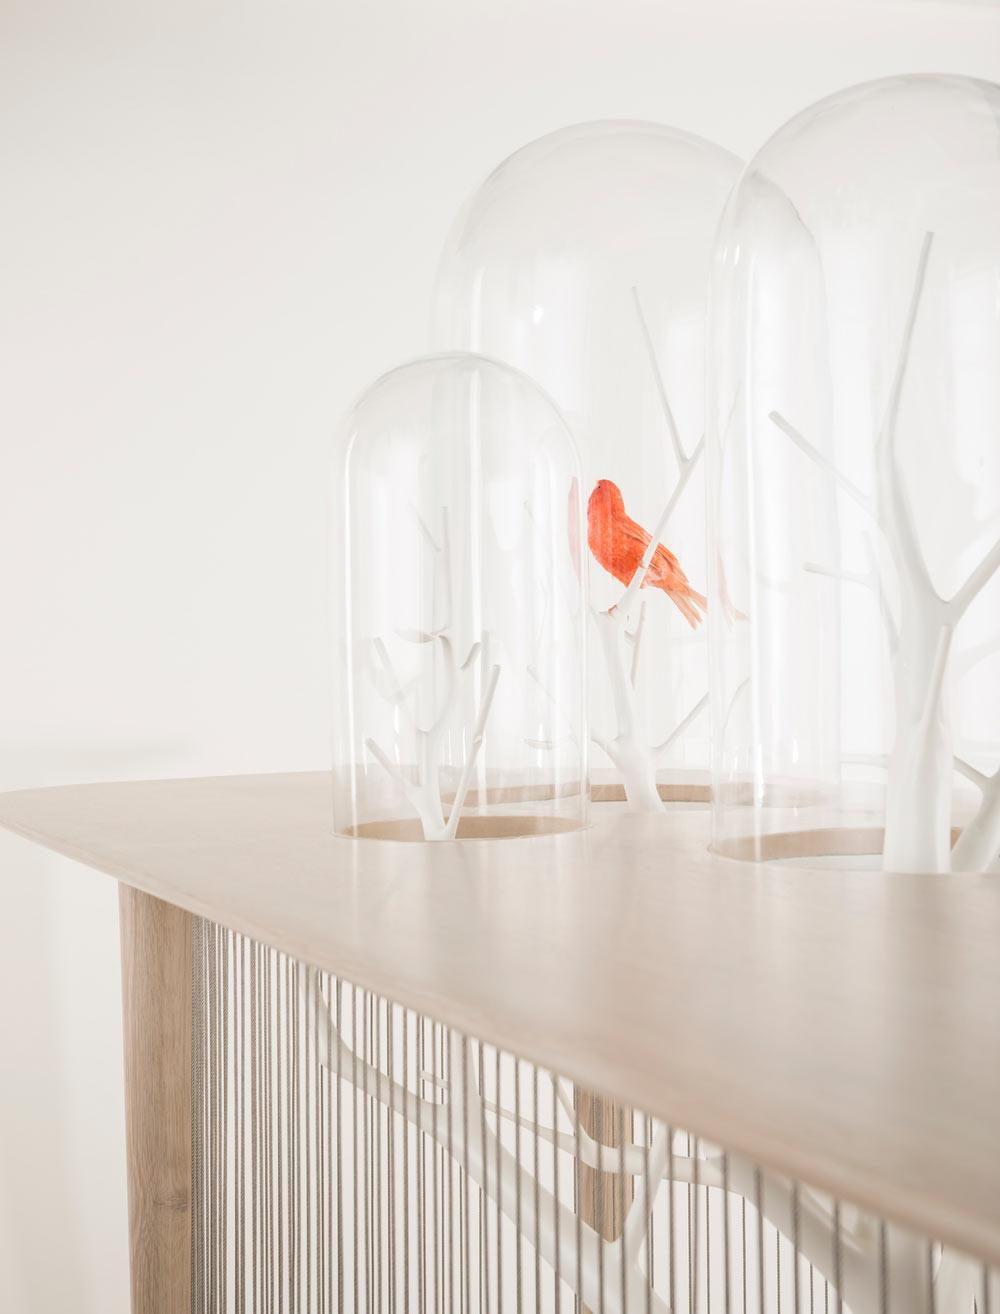 birdcage-table-gregoire-de-lafforest-03